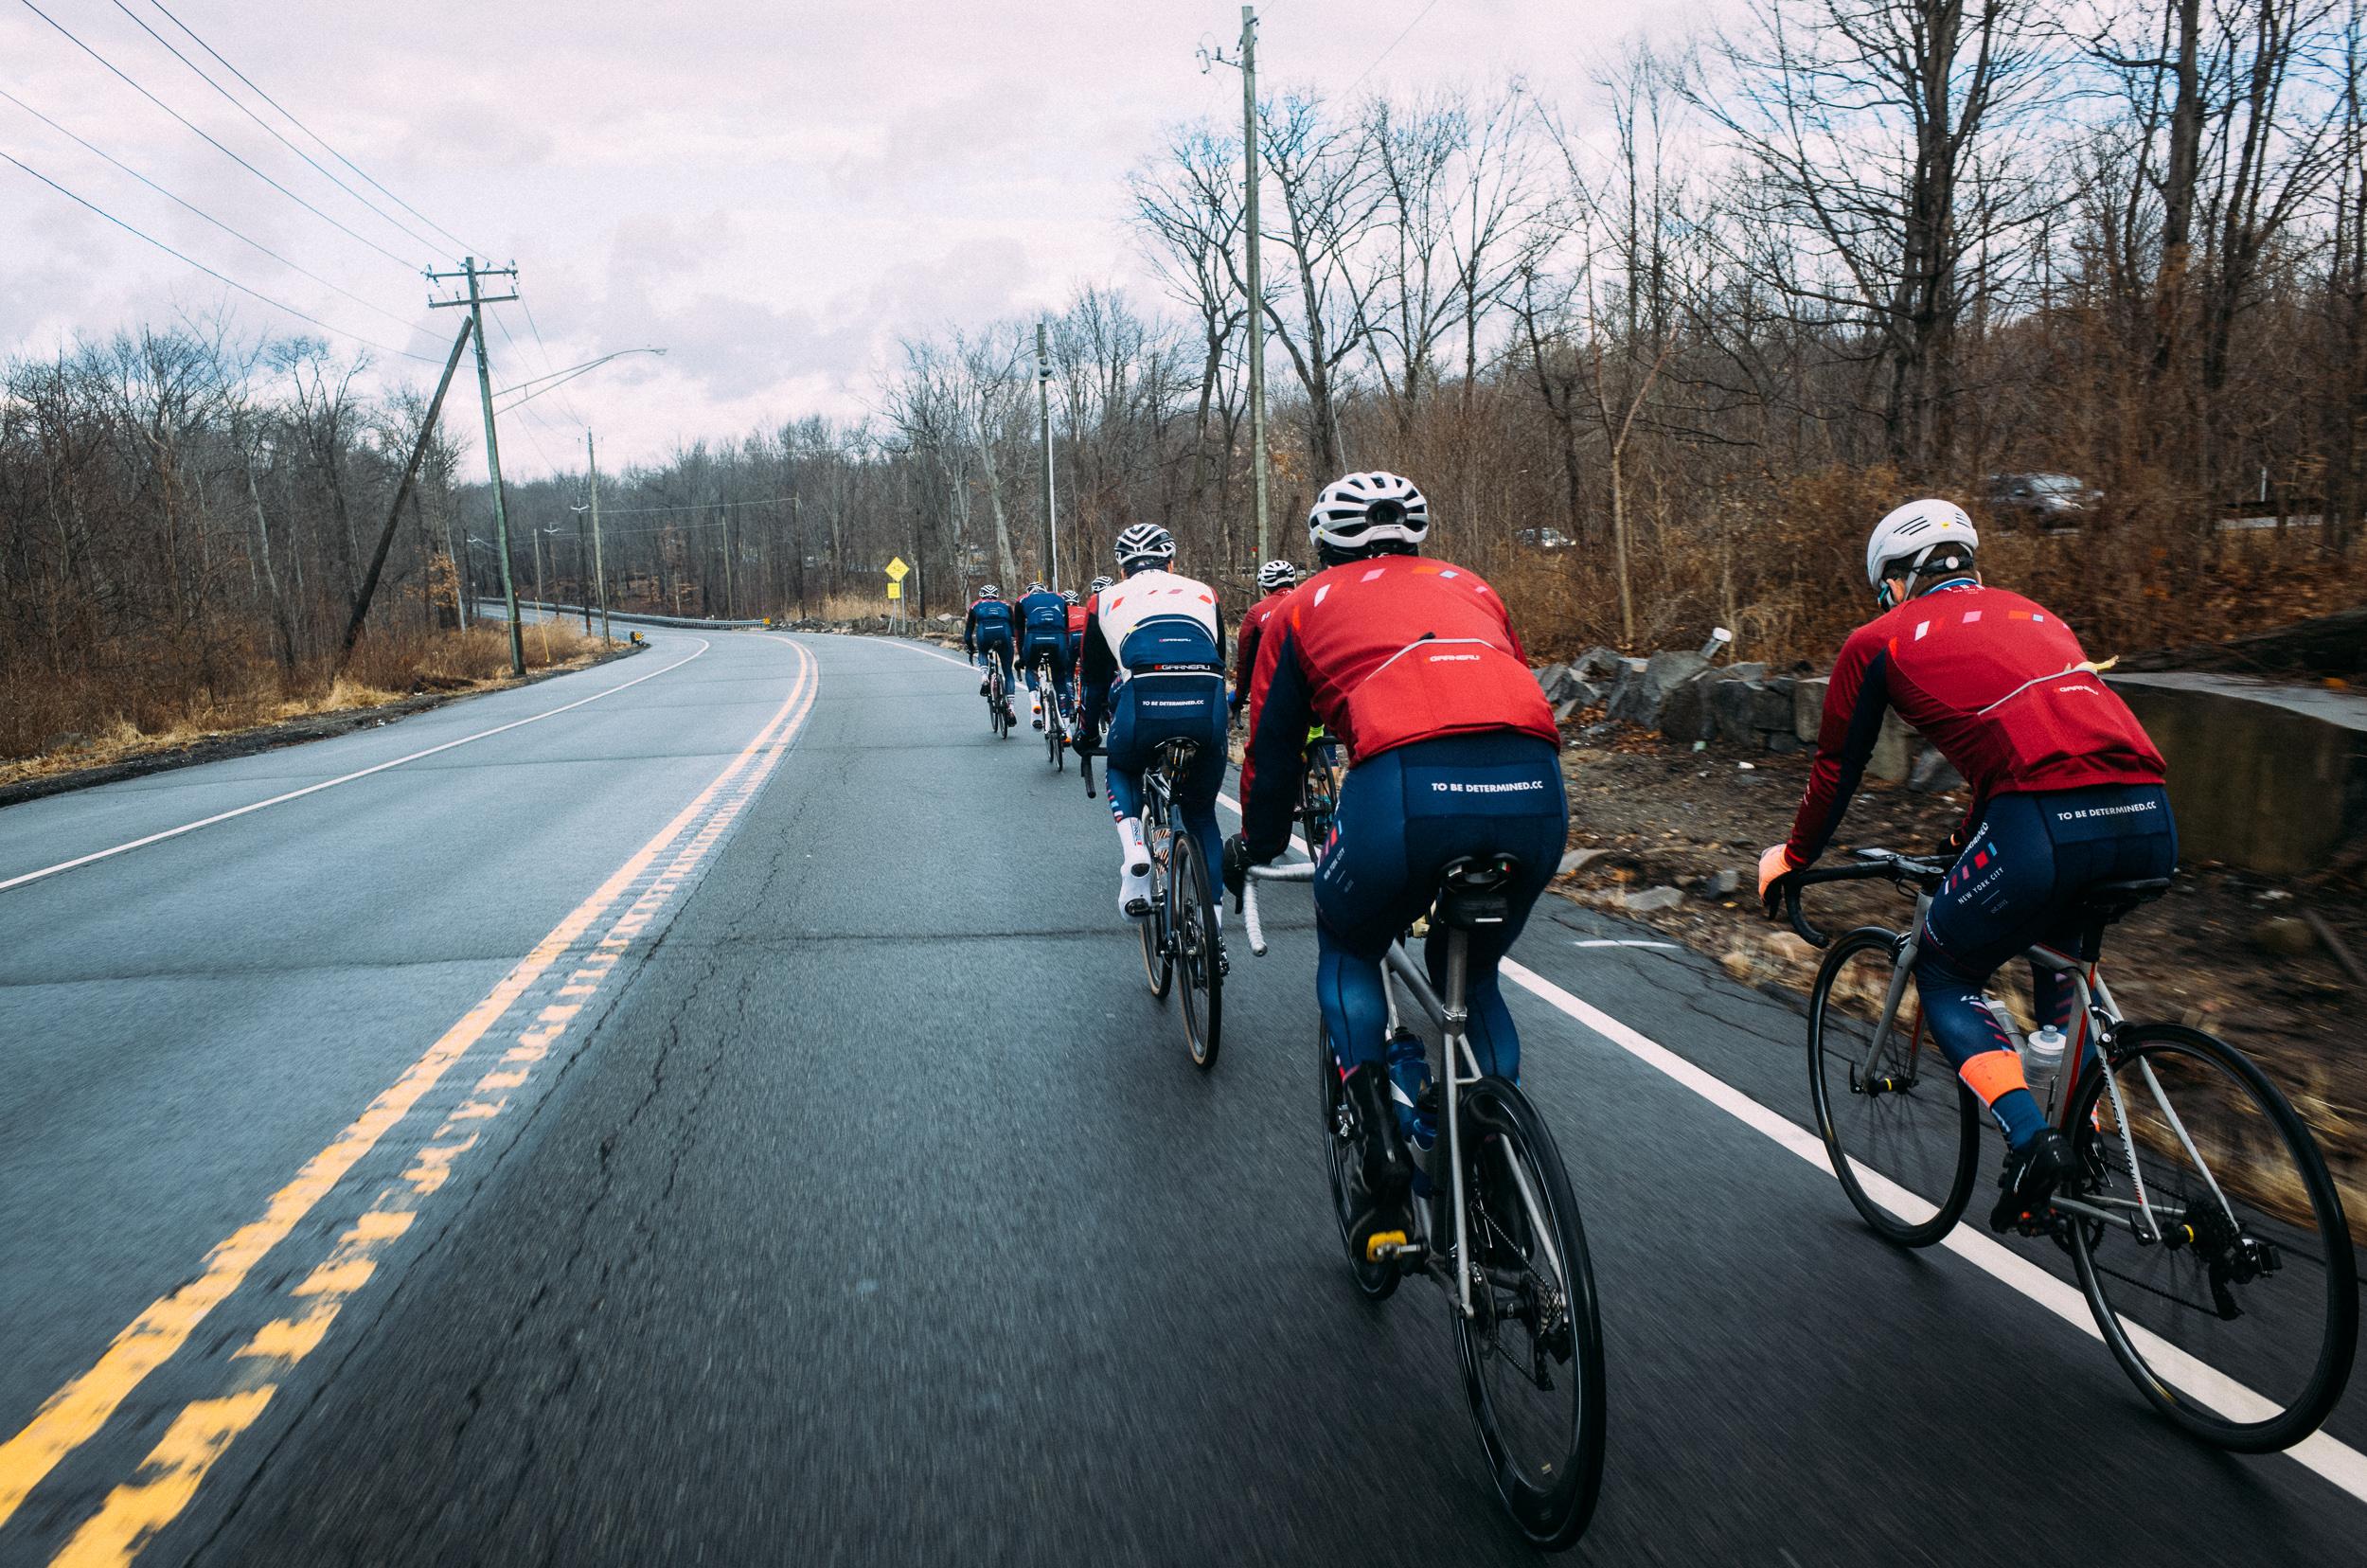 to-be-determined-photo-rhetoric-team-ride-january-1010.jpg